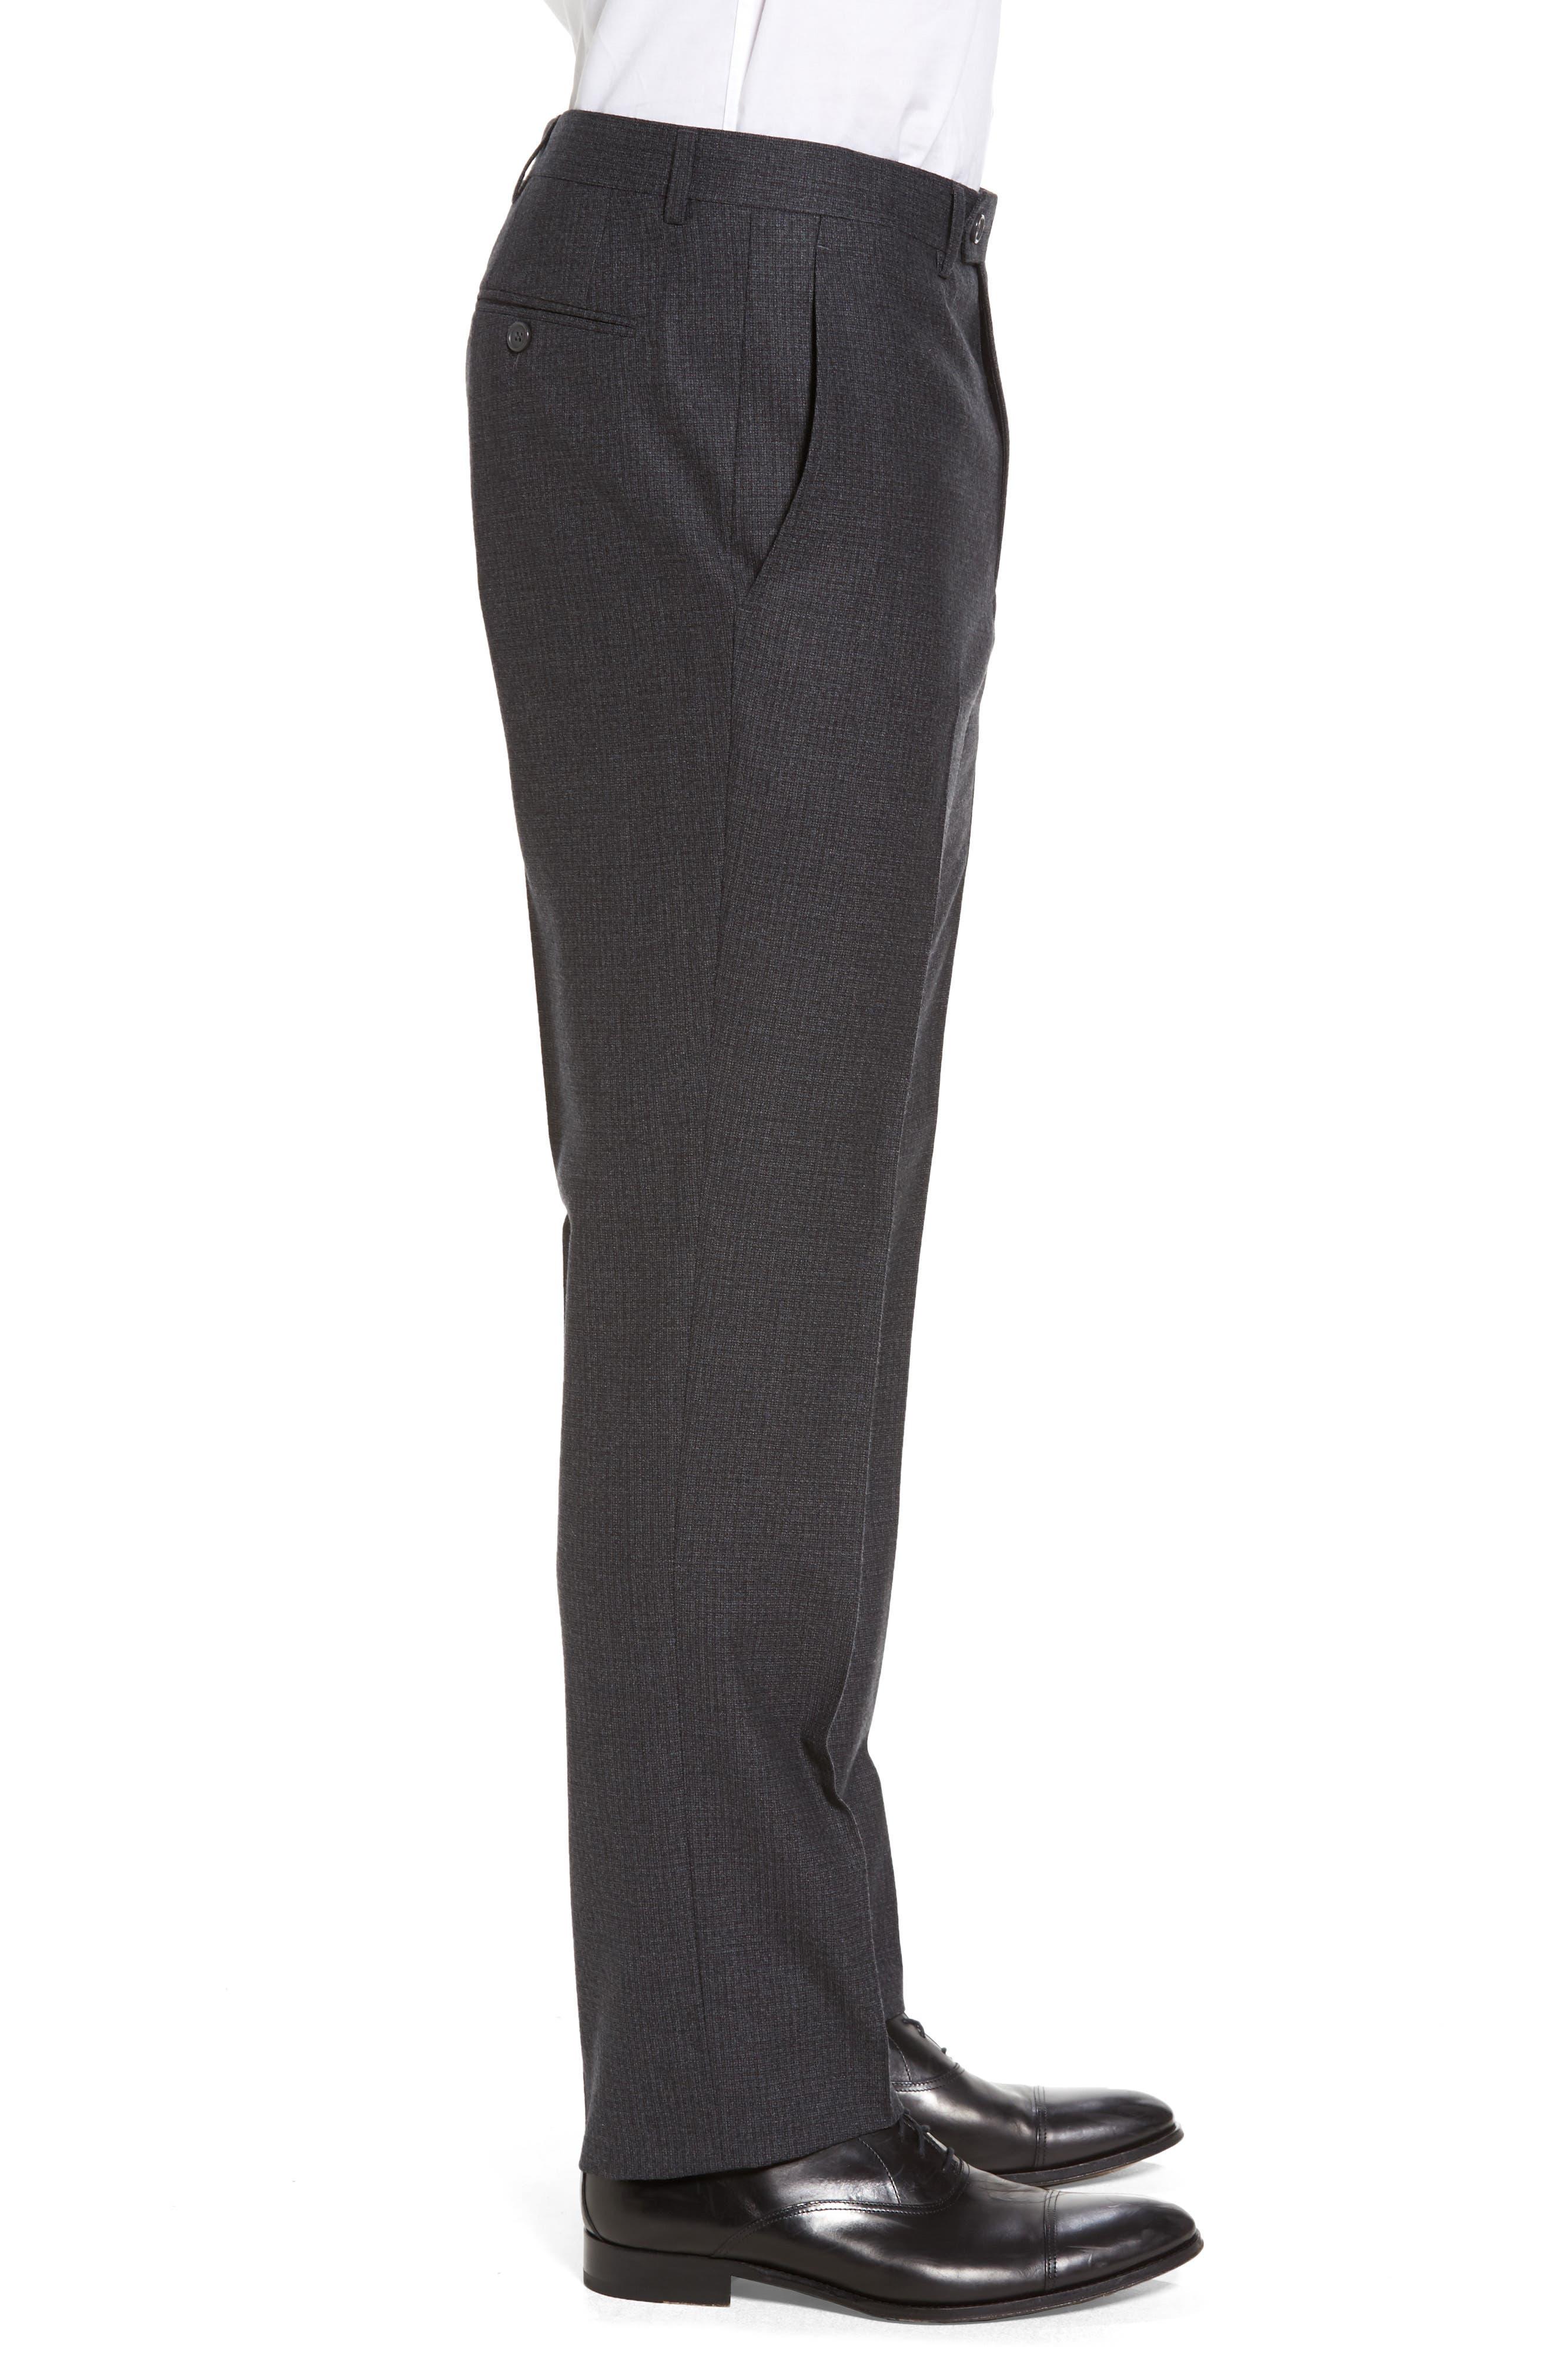 Romero Regular Fit Flat Front Trousers,                             Alternate thumbnail 4, color,                             010